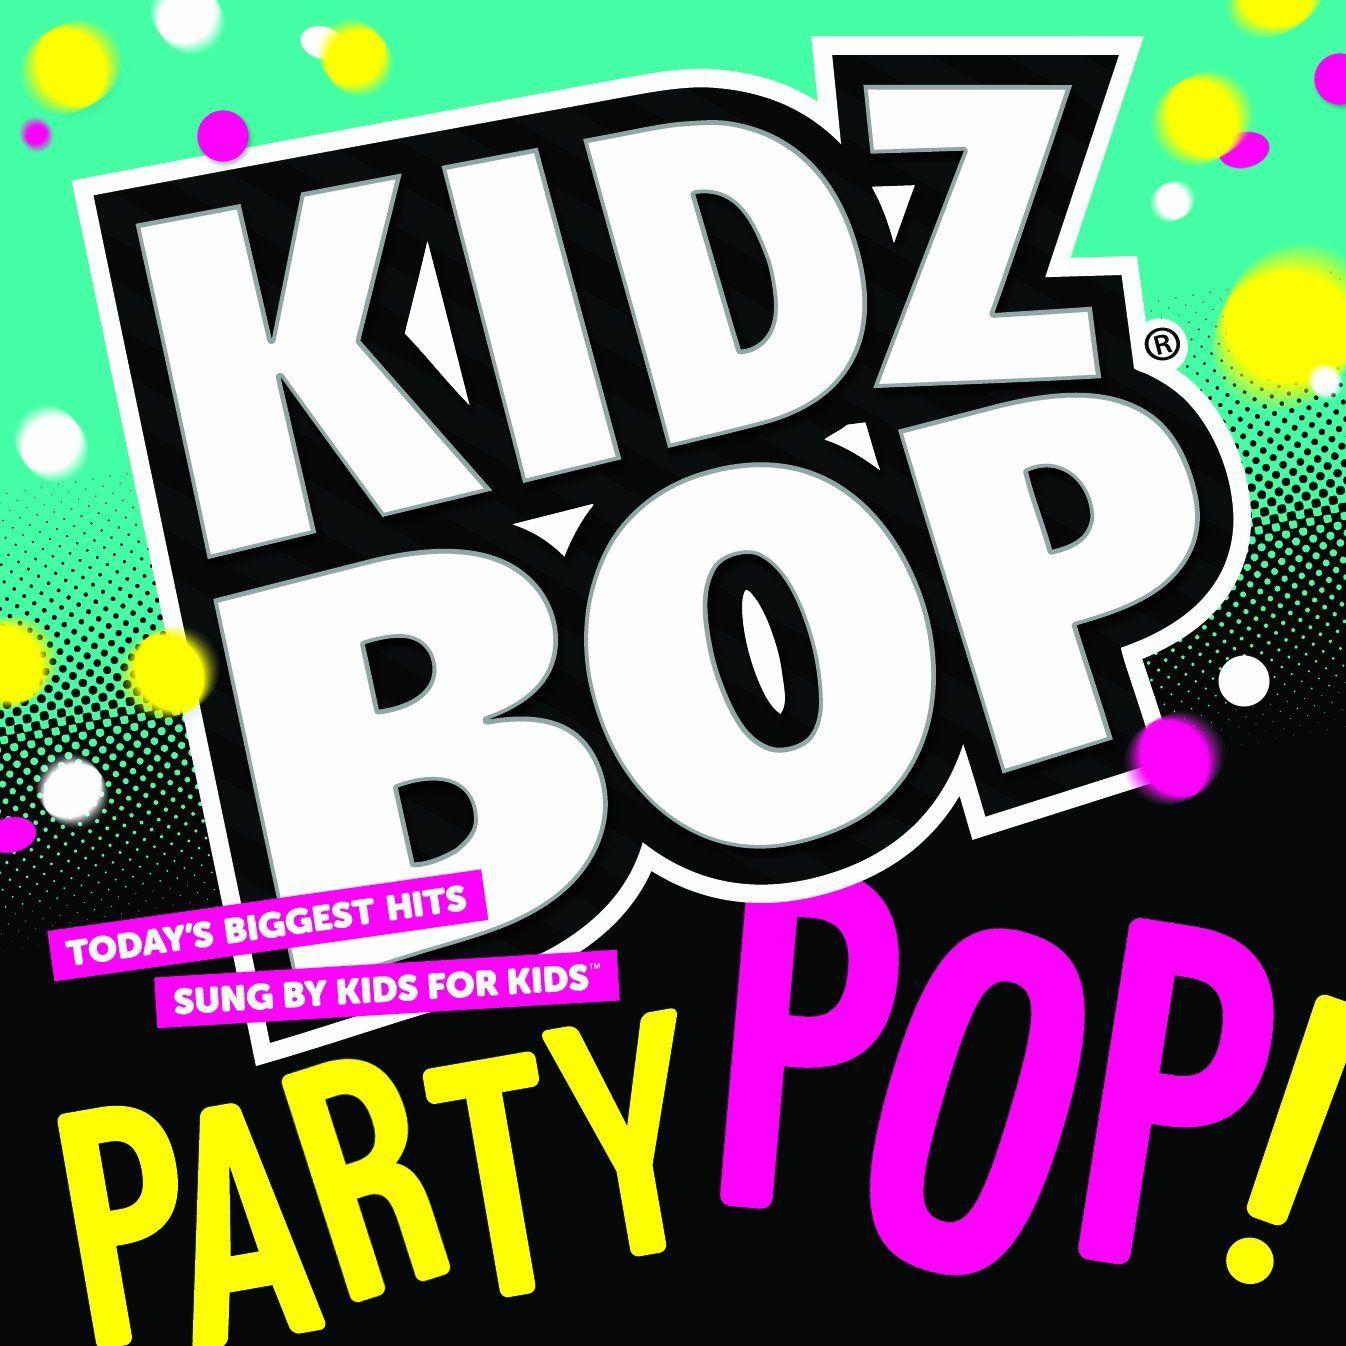 Kidz Bop Kids - Kidz Bop Party Pop!, Yellow | Party Planning: Kidz ...